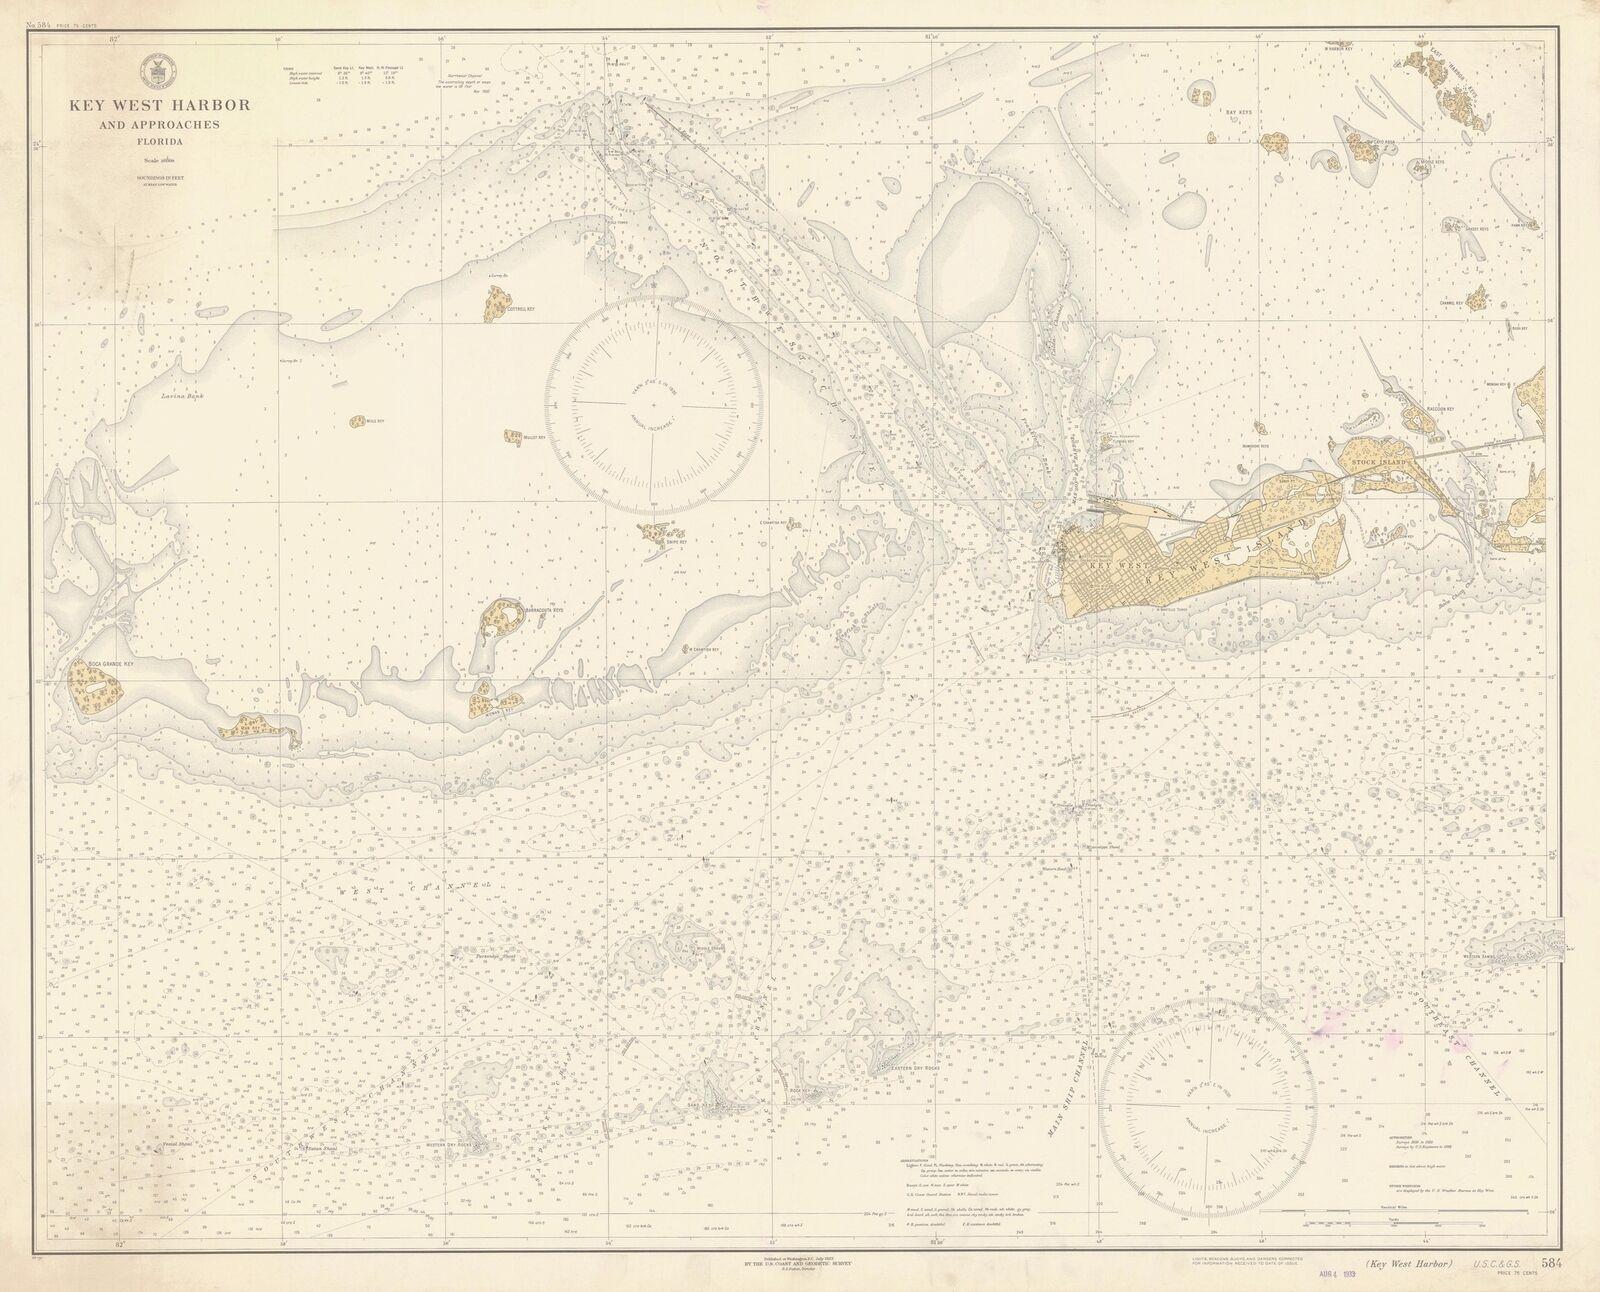 Key West Historical Map - 1933